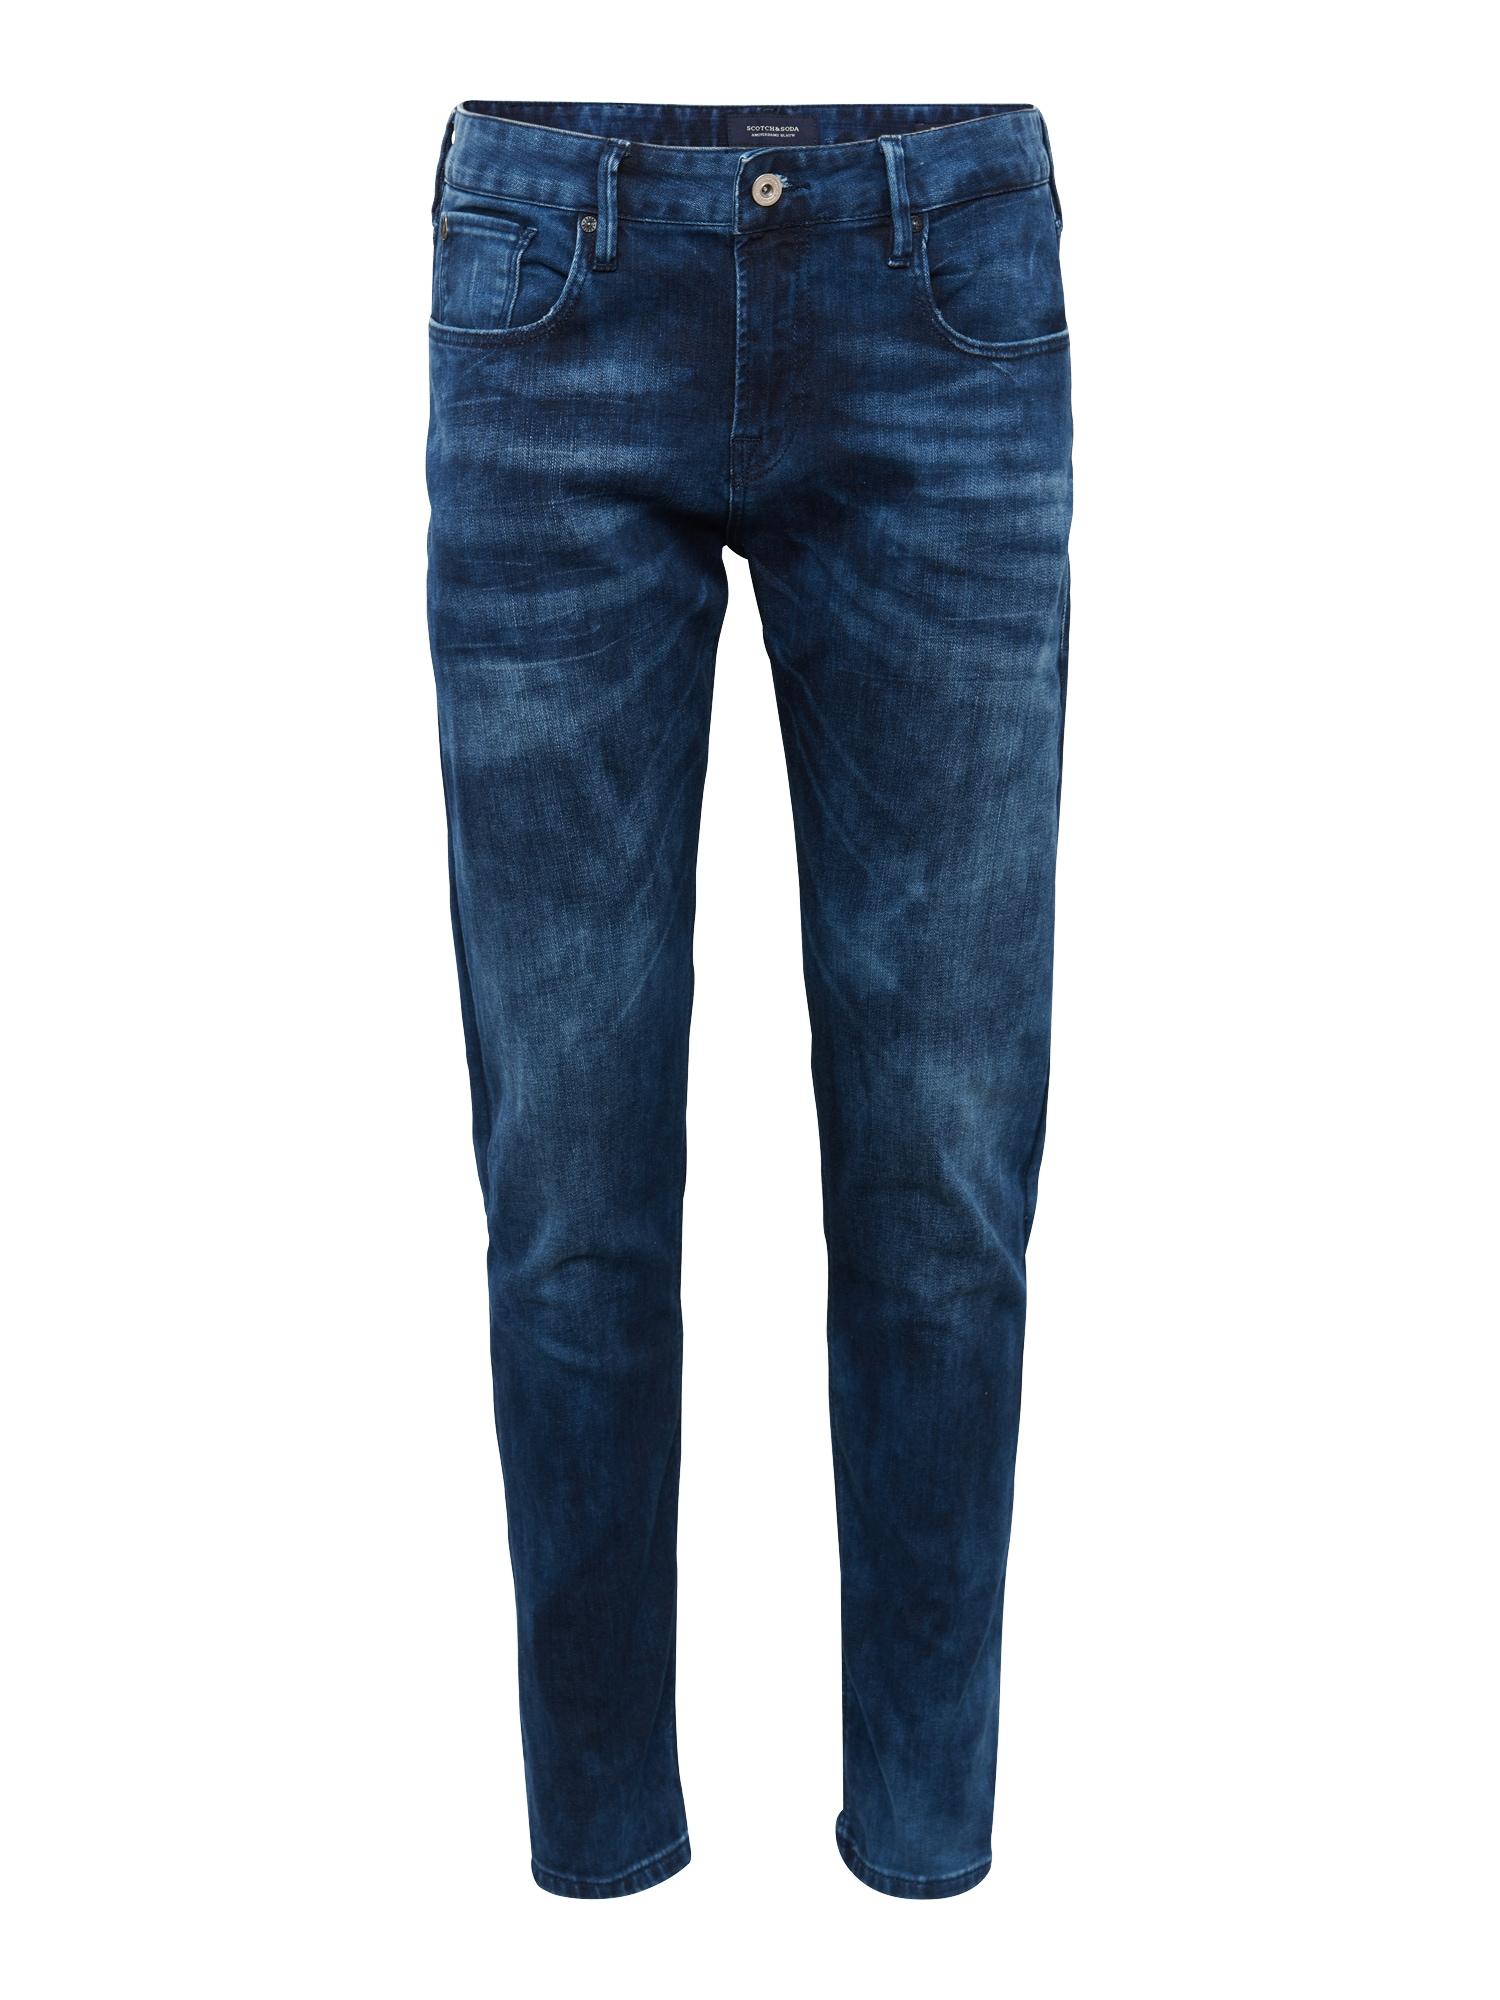 SCOTCH  and  SODA Heren Jeans Tye Blauw Flash blue denim